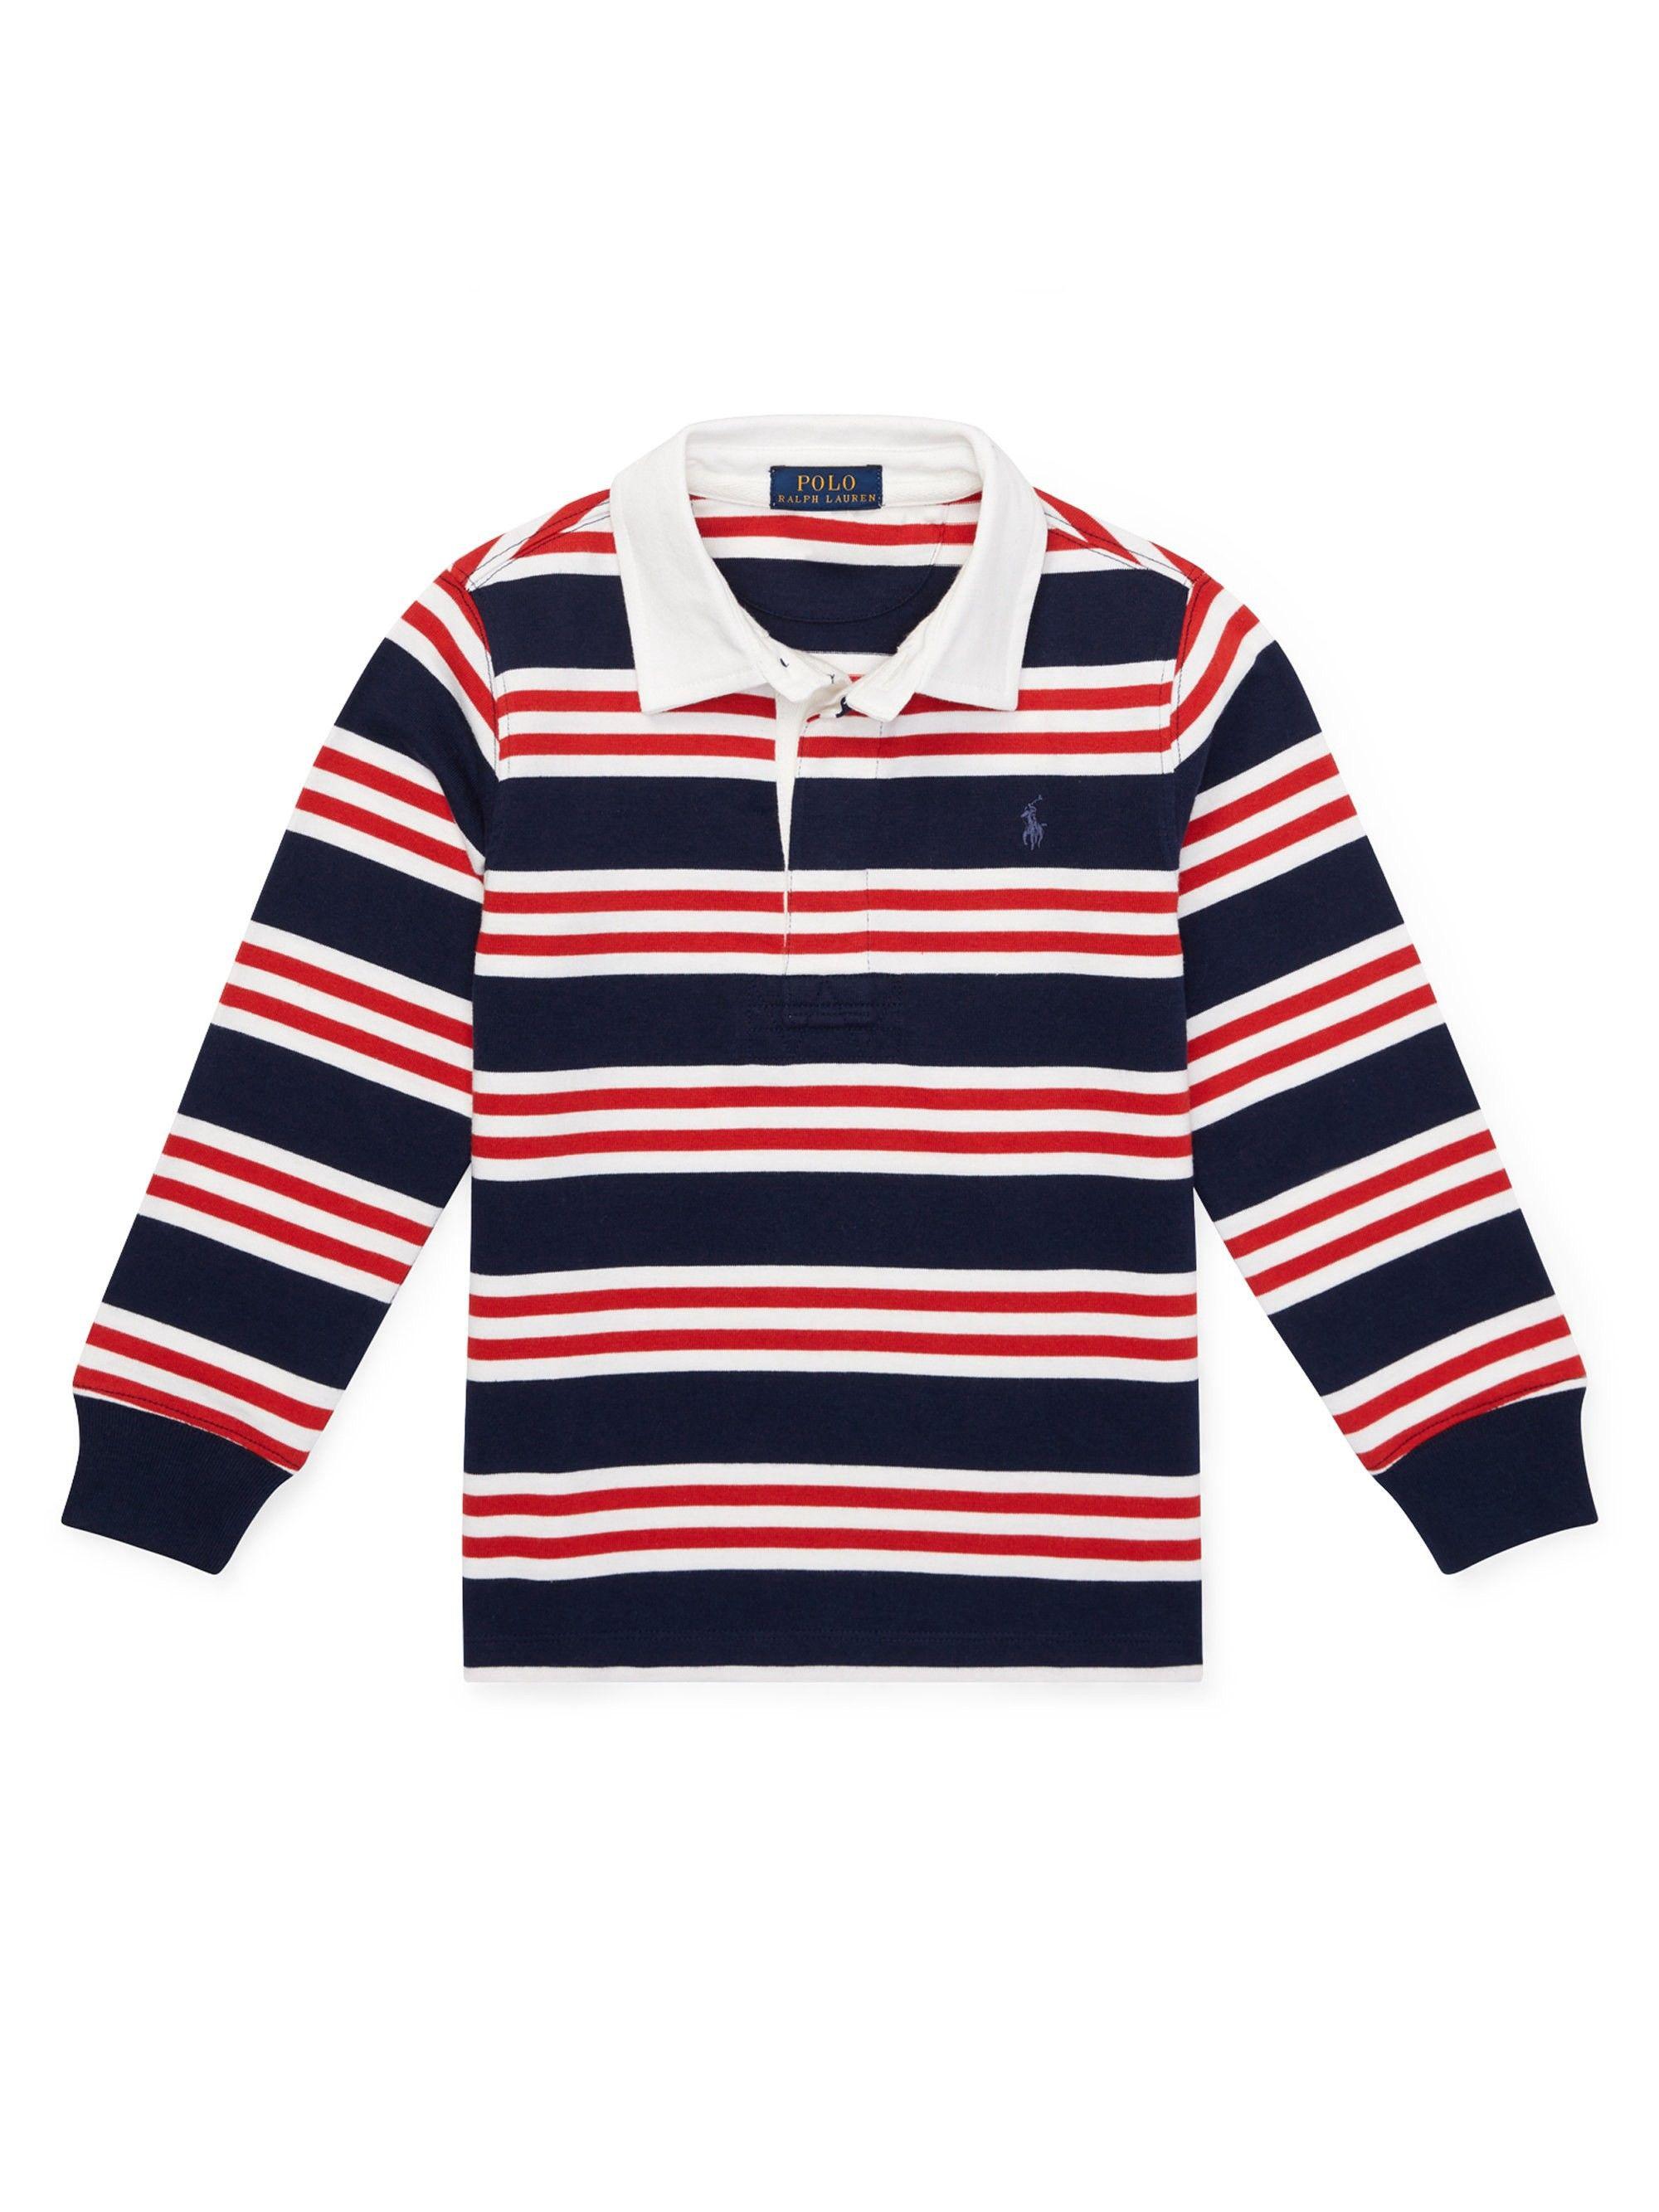 80c07c6a6f0 Ralph Lauren Little Boy's Striped Cotton Jersey Rugby Shirt - French Navy 4T